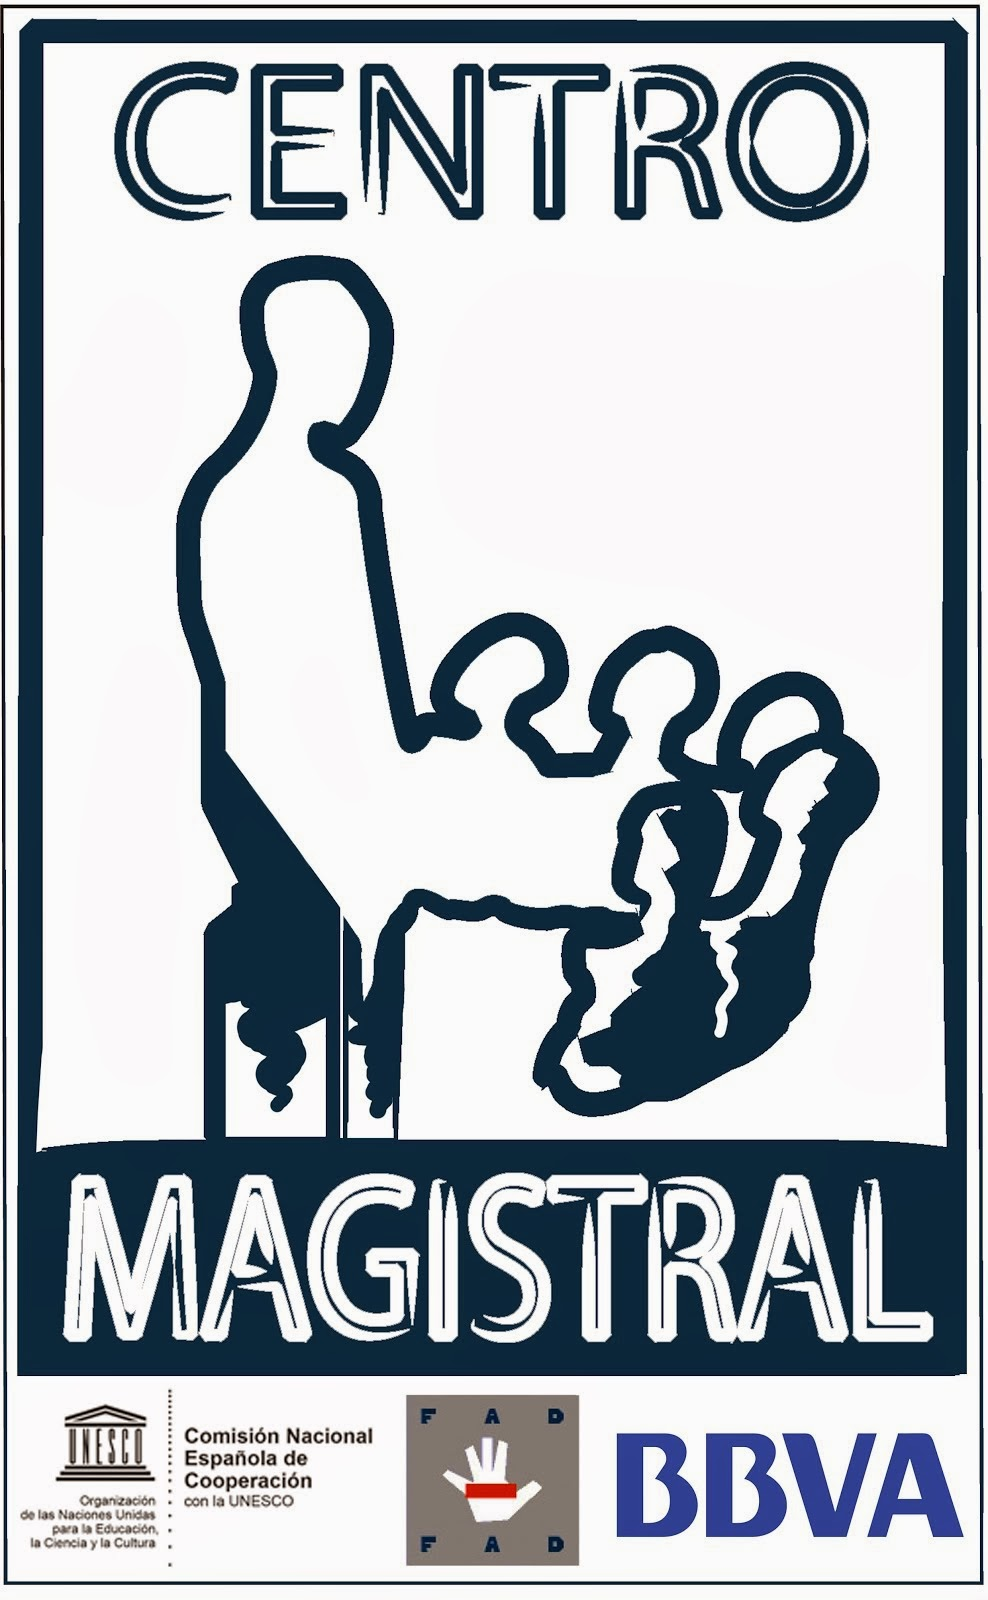 Sello de Centro Magistral para el IES Torrellano